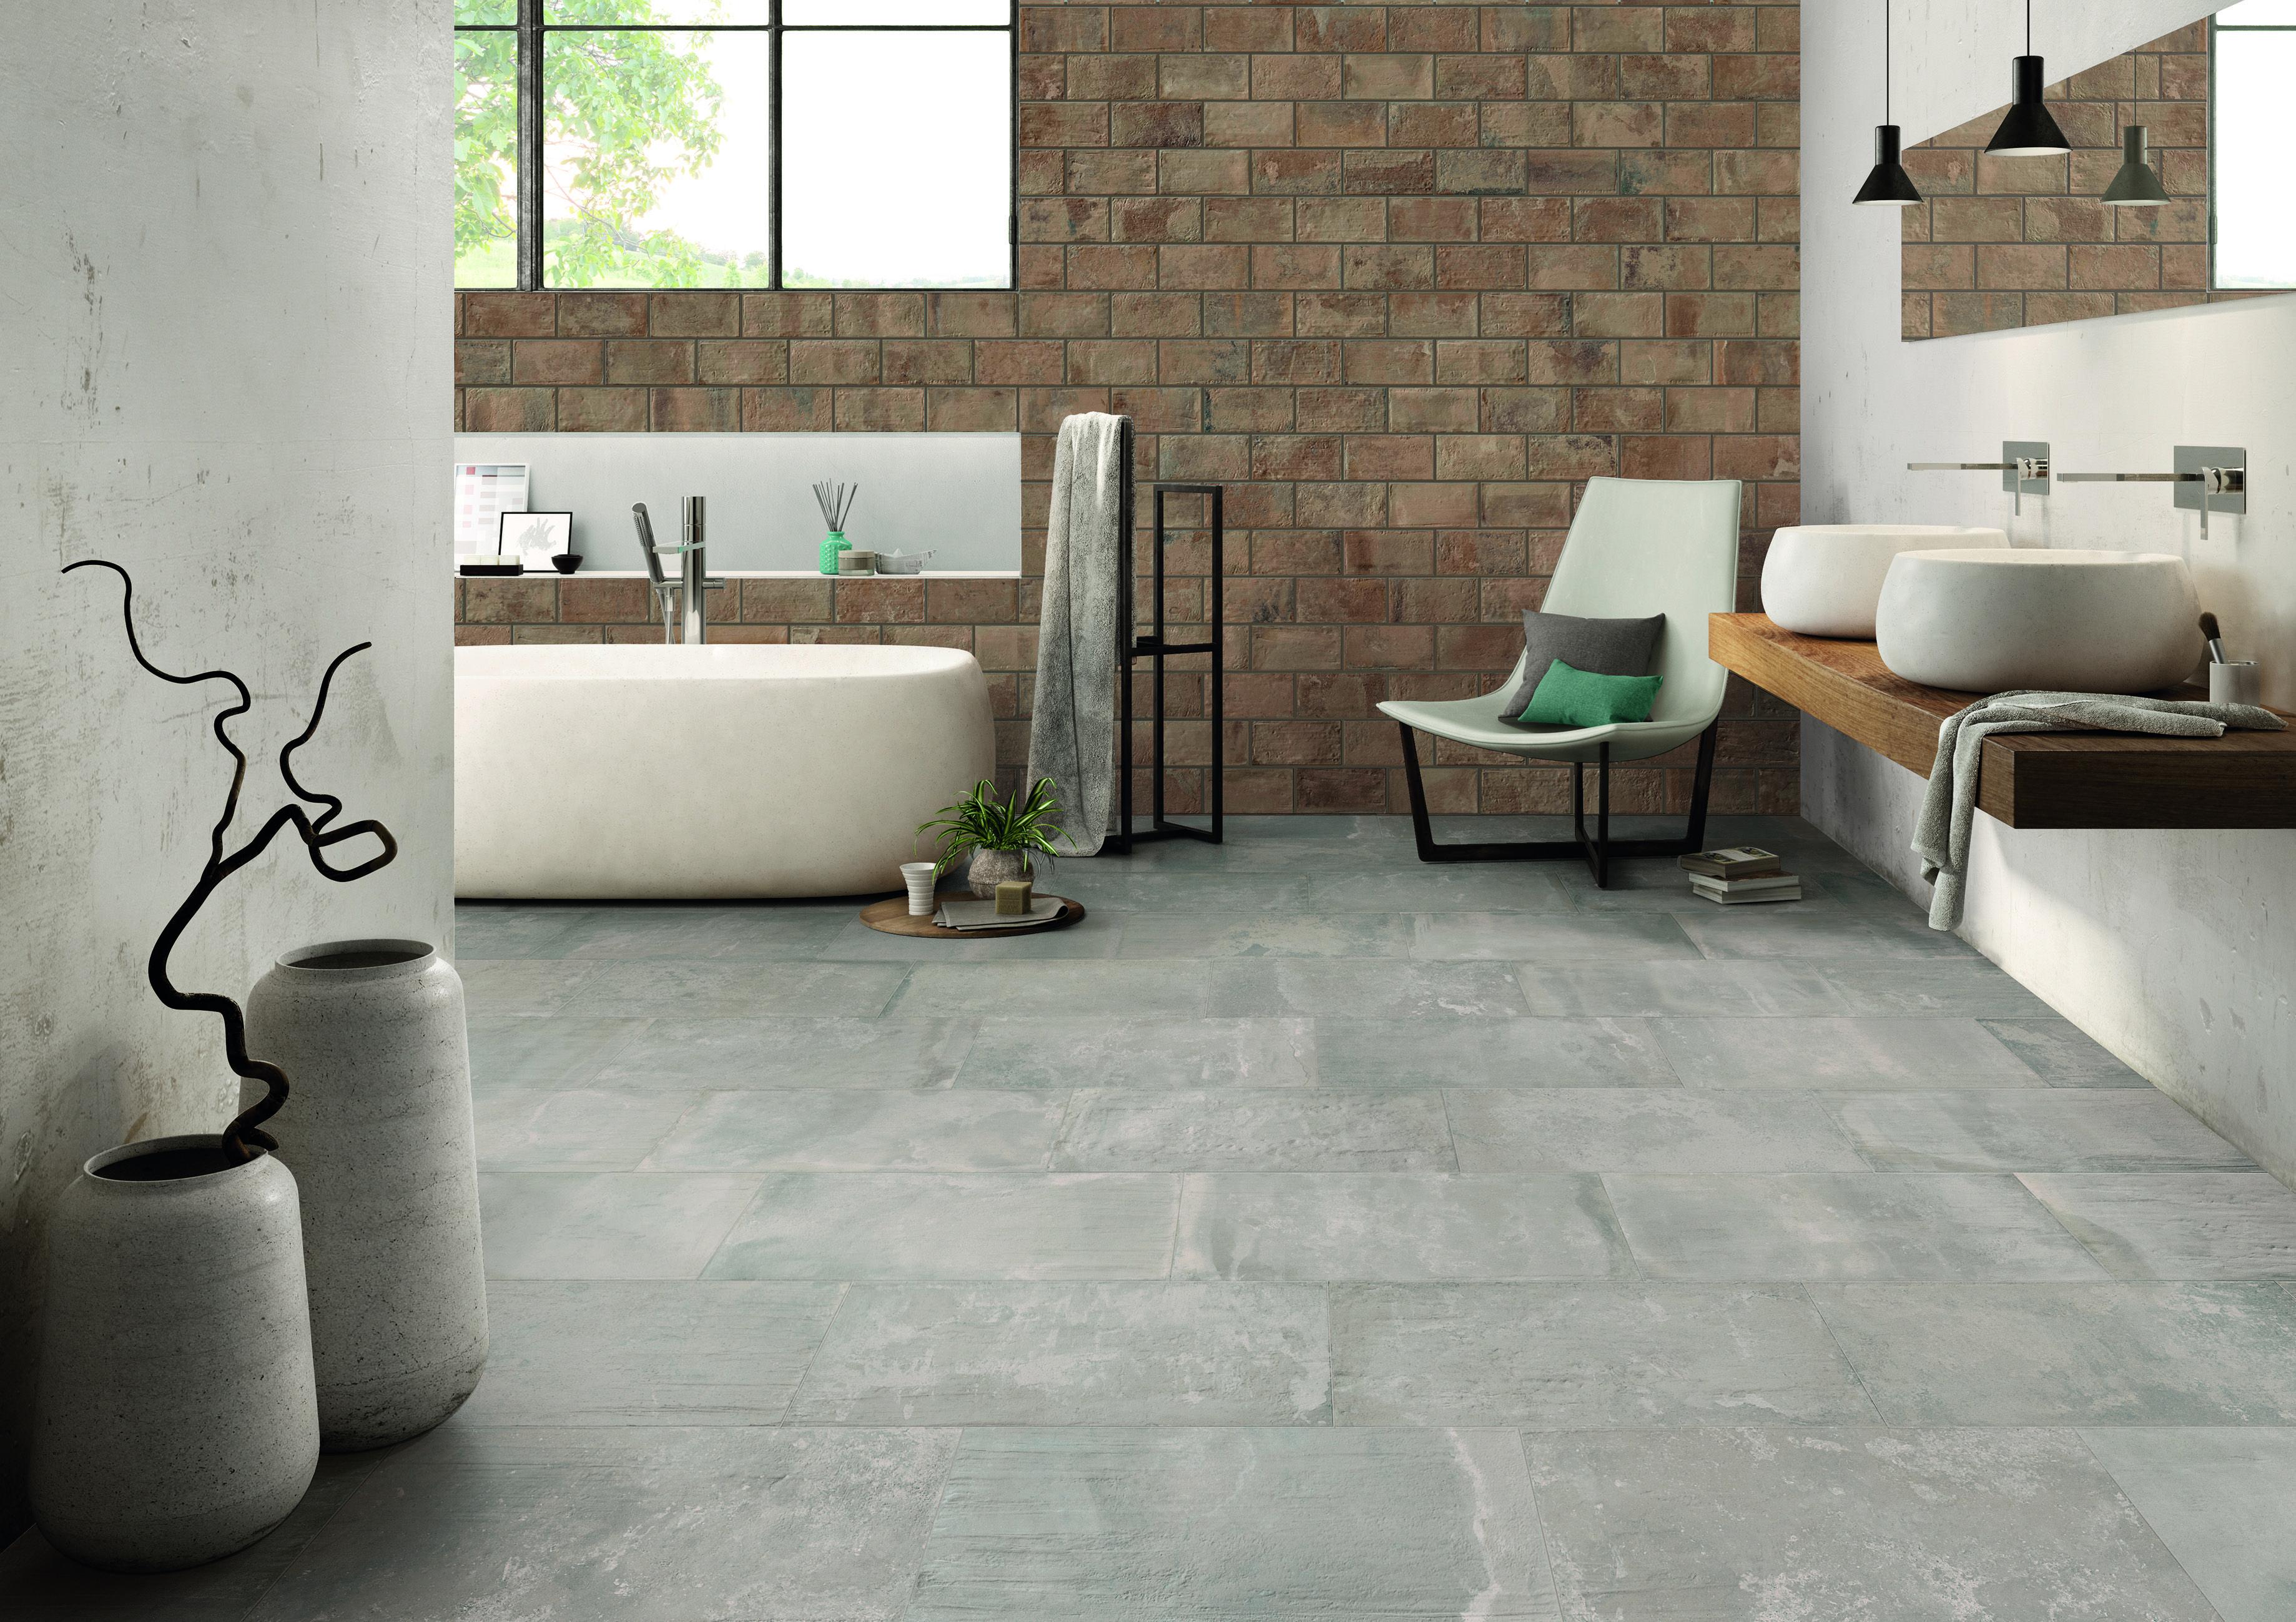 Beautiful 1200 X 1200 Floor Tiles Thin 2 Inch Ceramic Tile Shaped 3X6 Glass Subway Tile 4 X 10 Subway Tile Young 4 X 4 Ceramic Tile Pink4X4 Ceramic Tile Home Depot Emilceramica   Kotto XS Collection   Colours: Mattone \u0026 Cenere ..